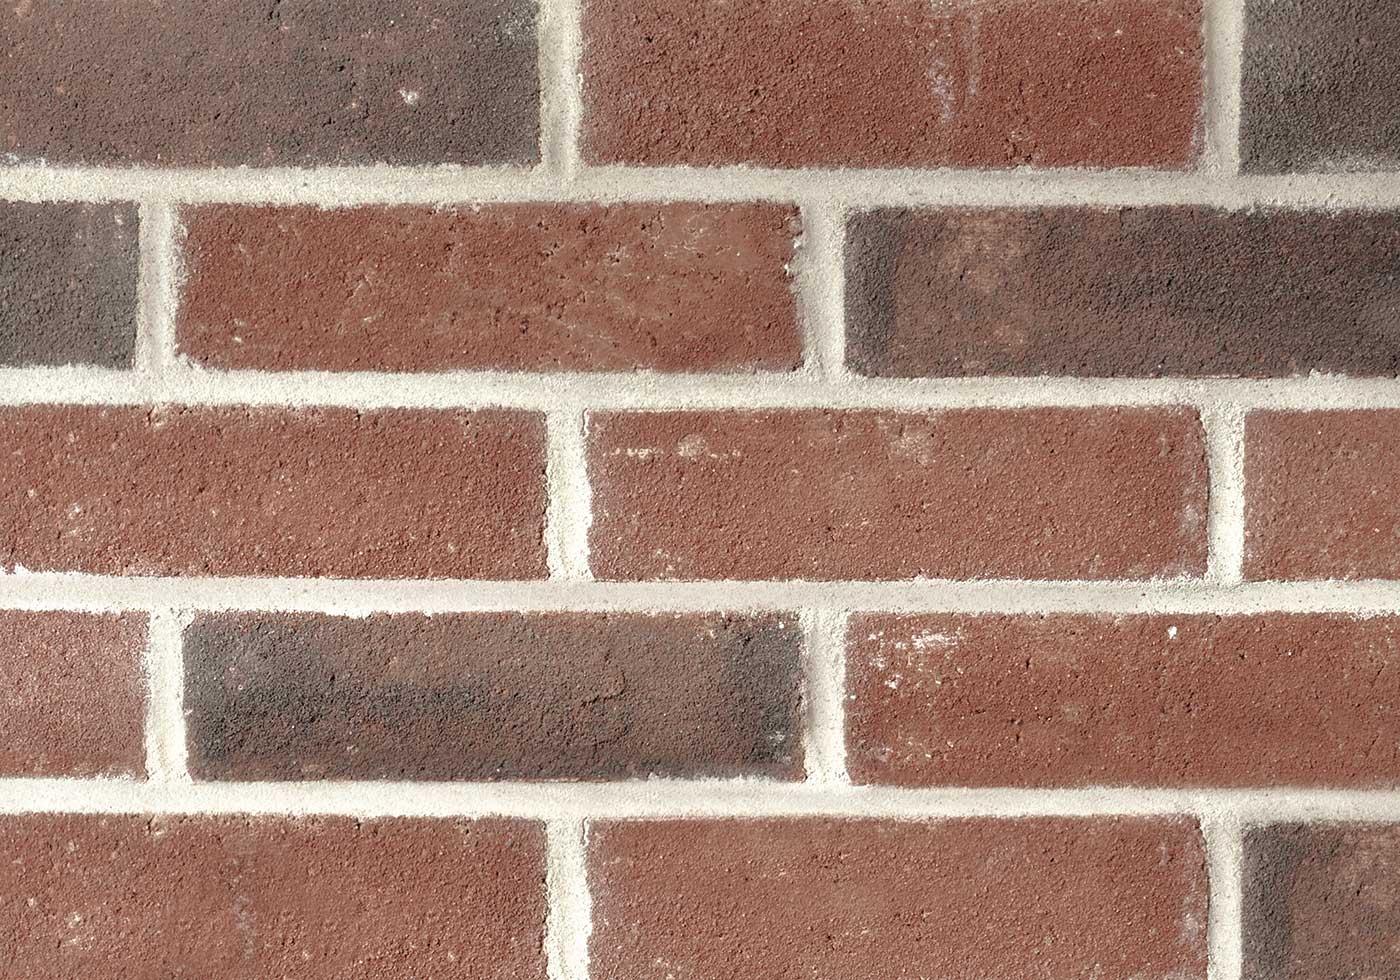 Nantucket brick close-up